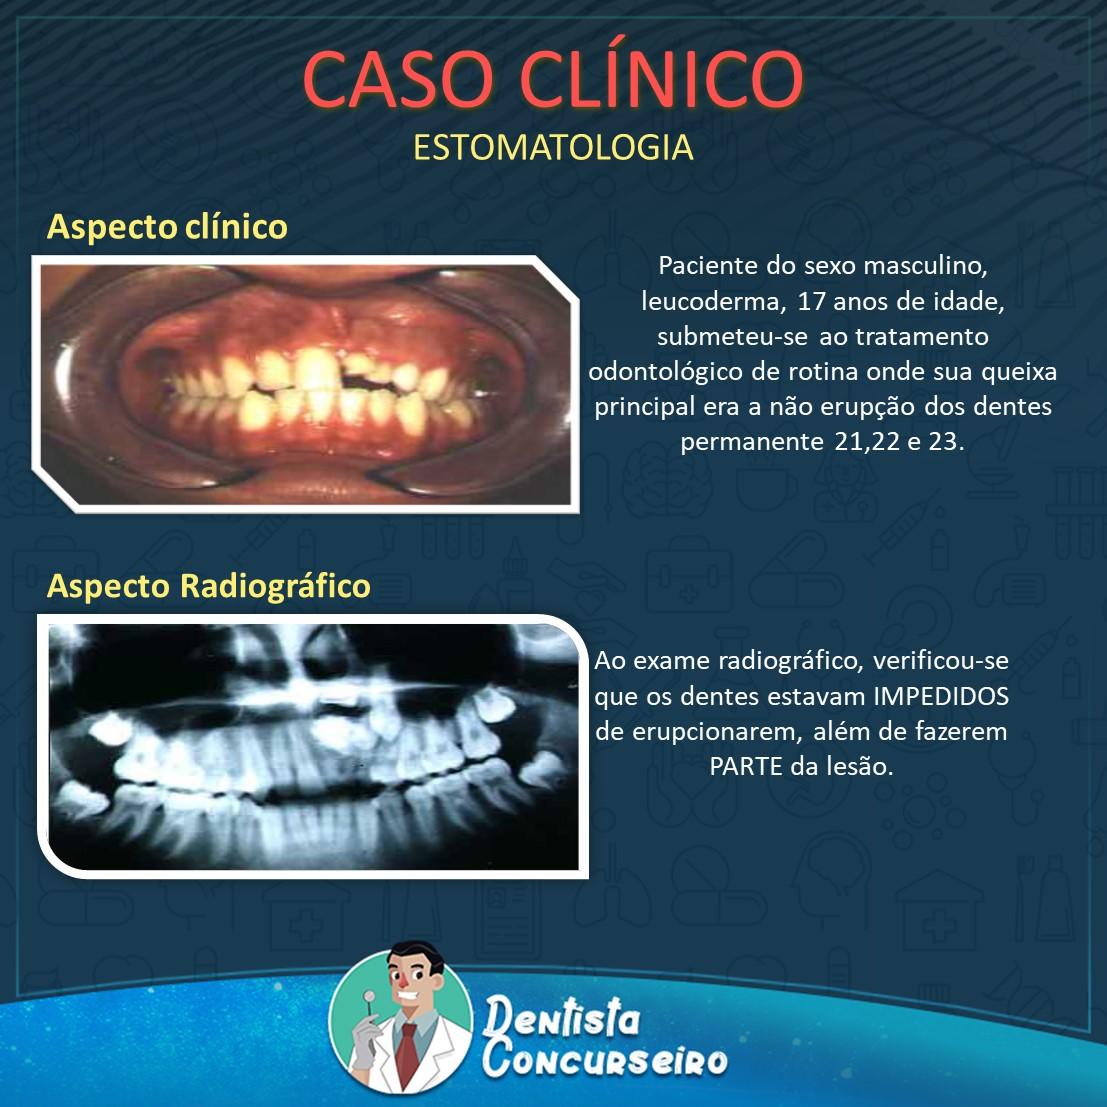 Caso Clínico de Estomatologia | Odontologia